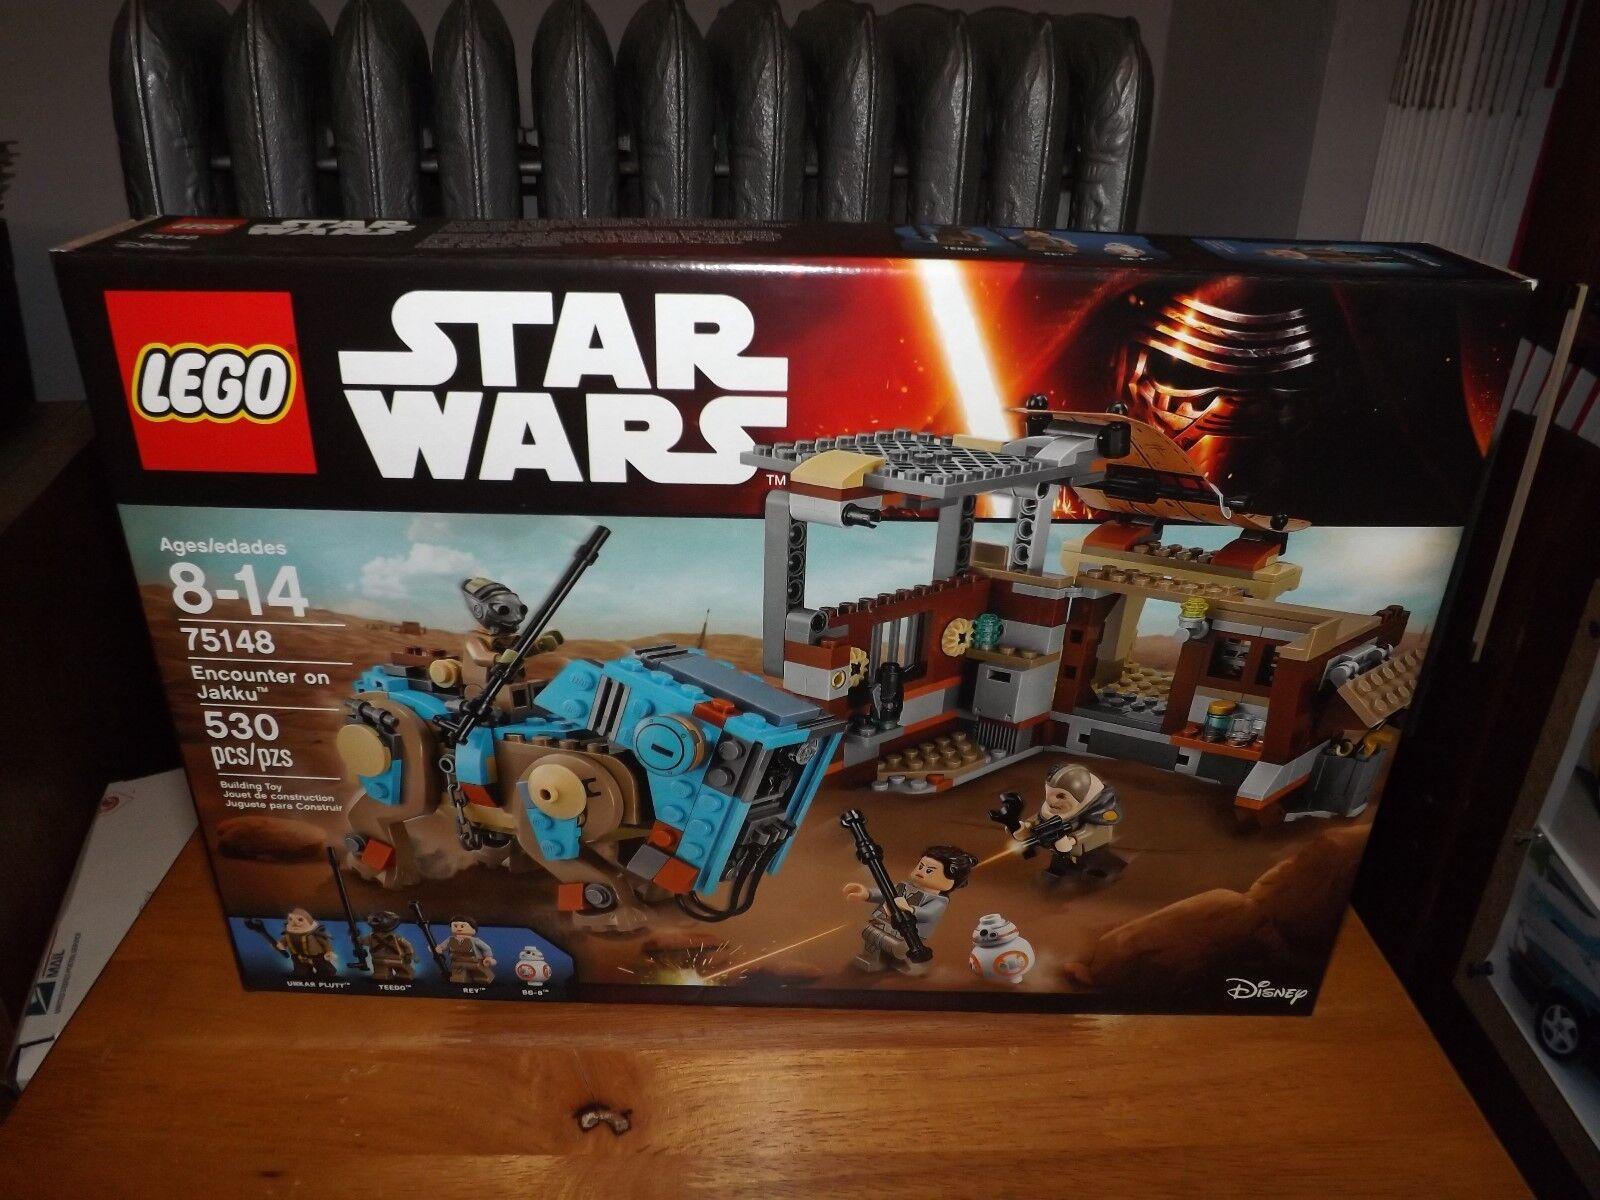 LEGO, STAR WARS, ENCOUNTER ON JAKKU, KIT  75148, 530 PIECES, NEW IN BOX, 2016